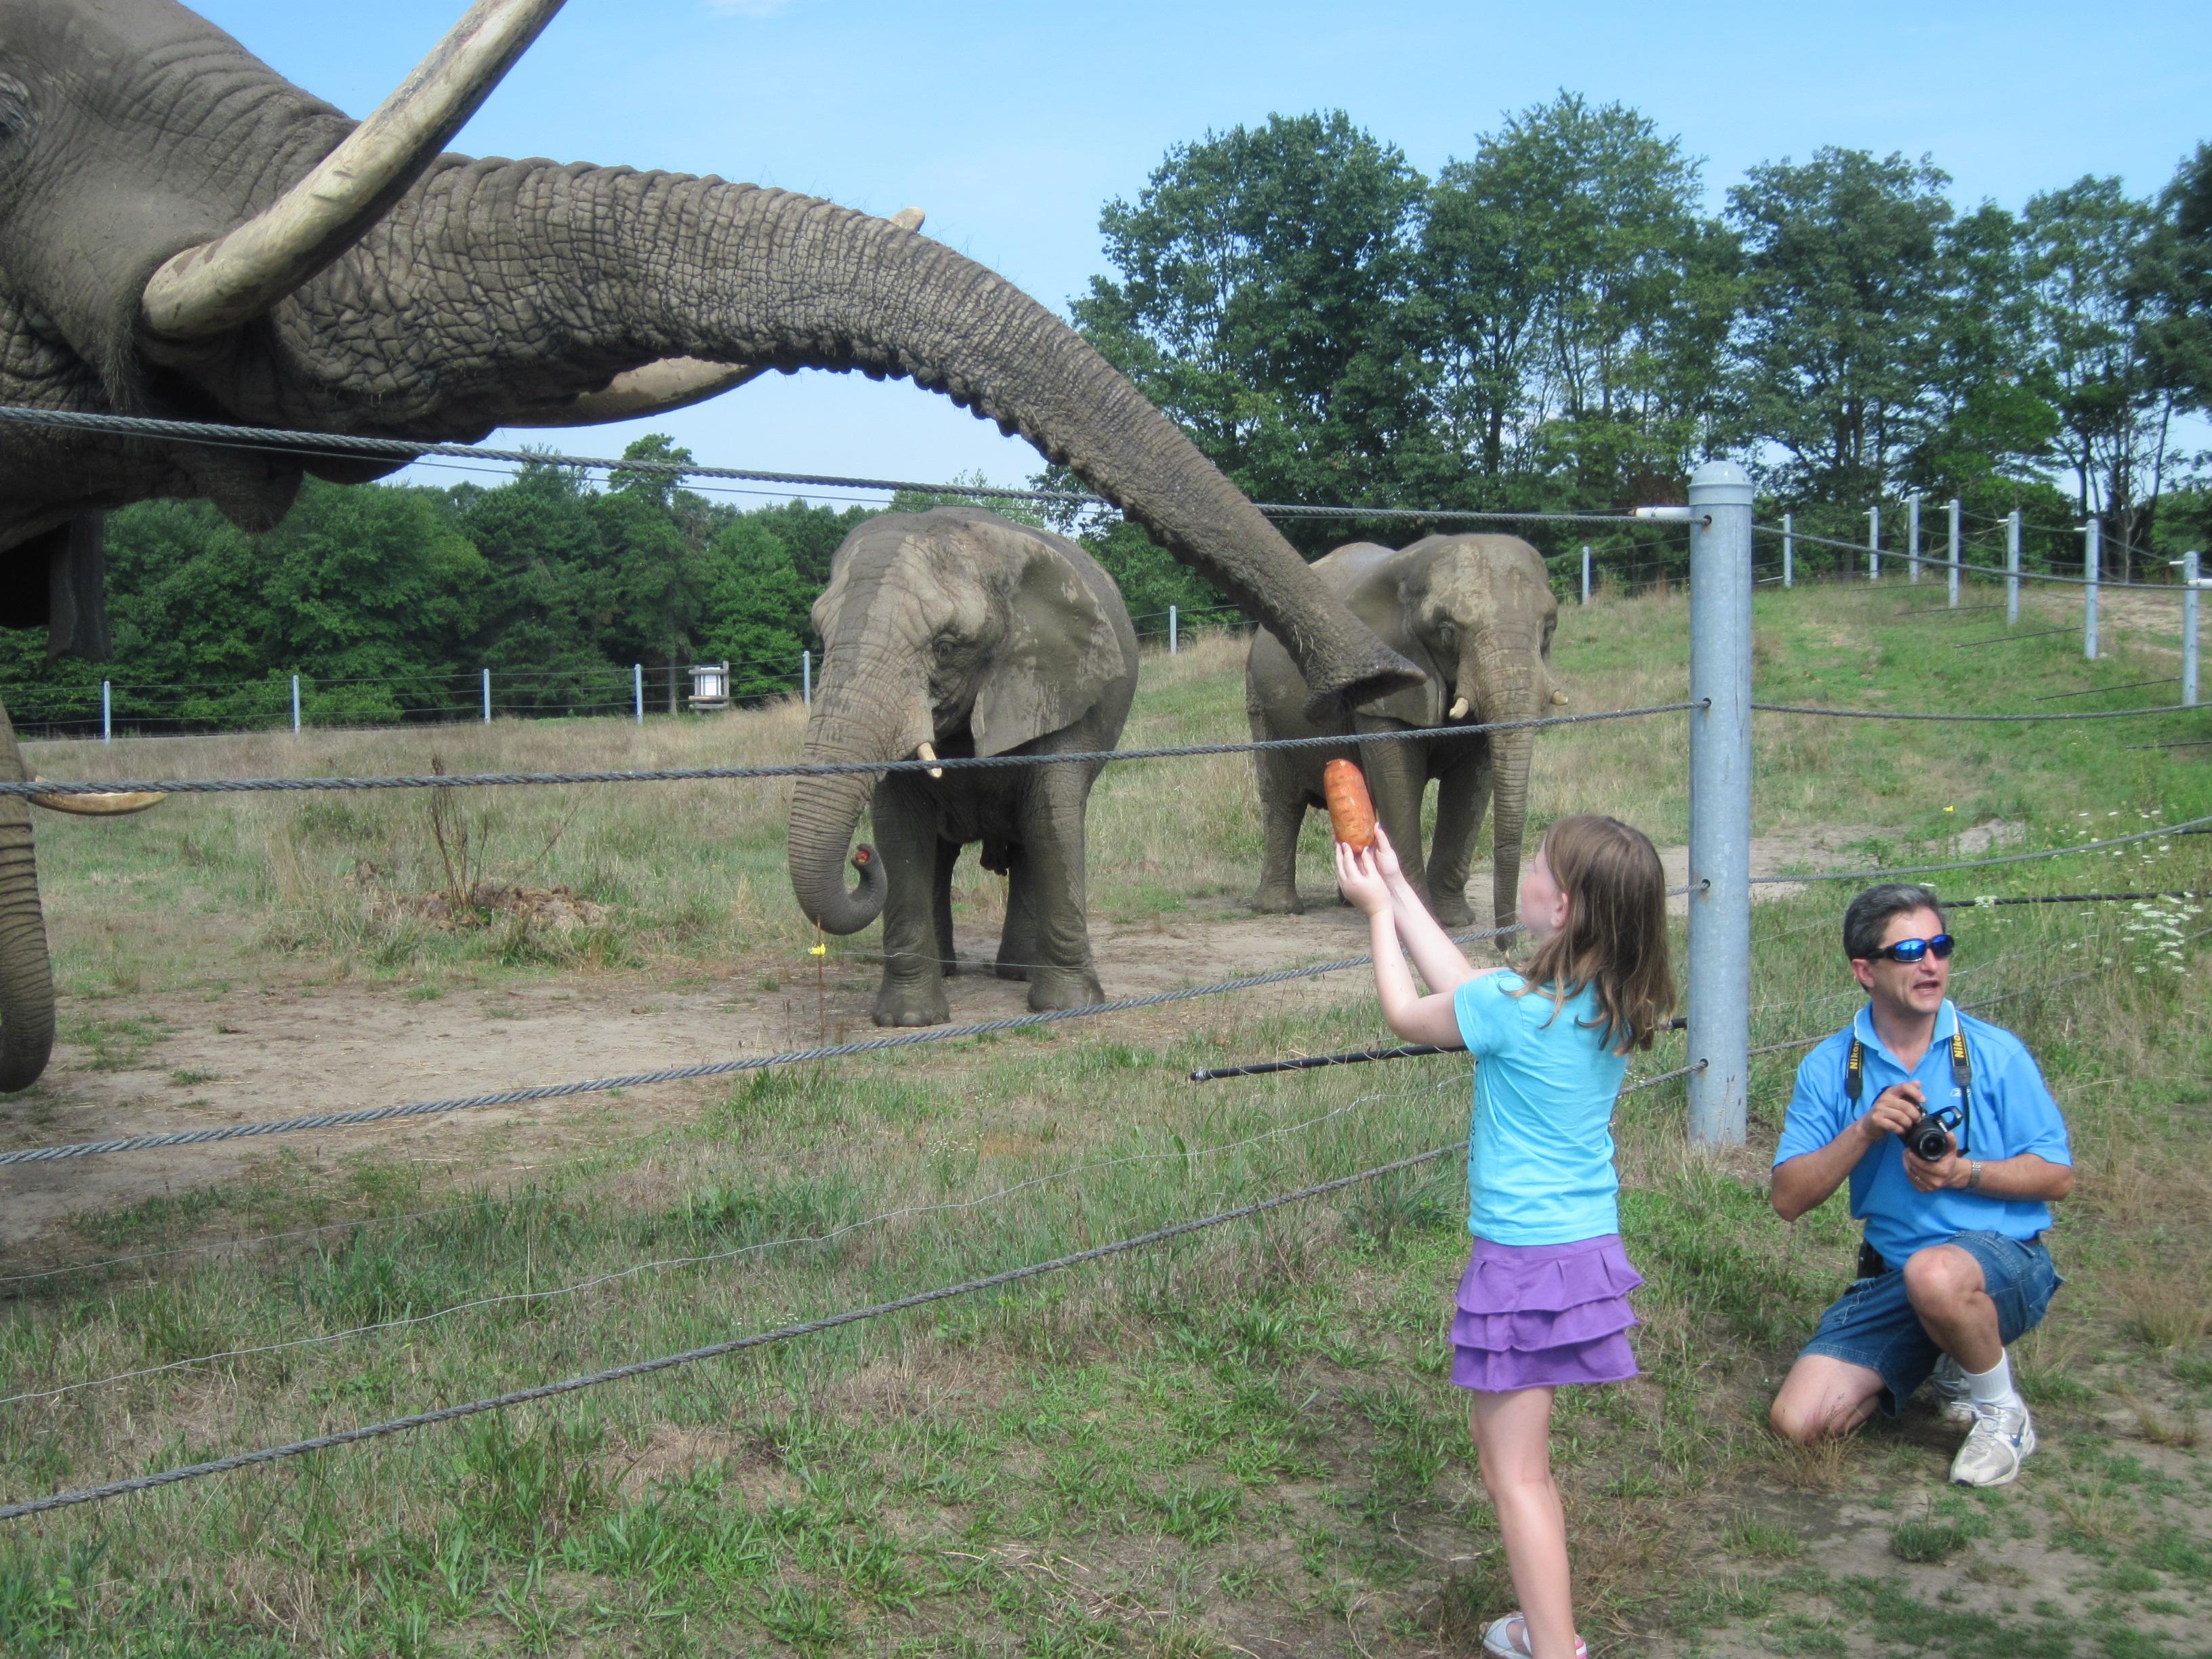 Safari Tour In New Jersey